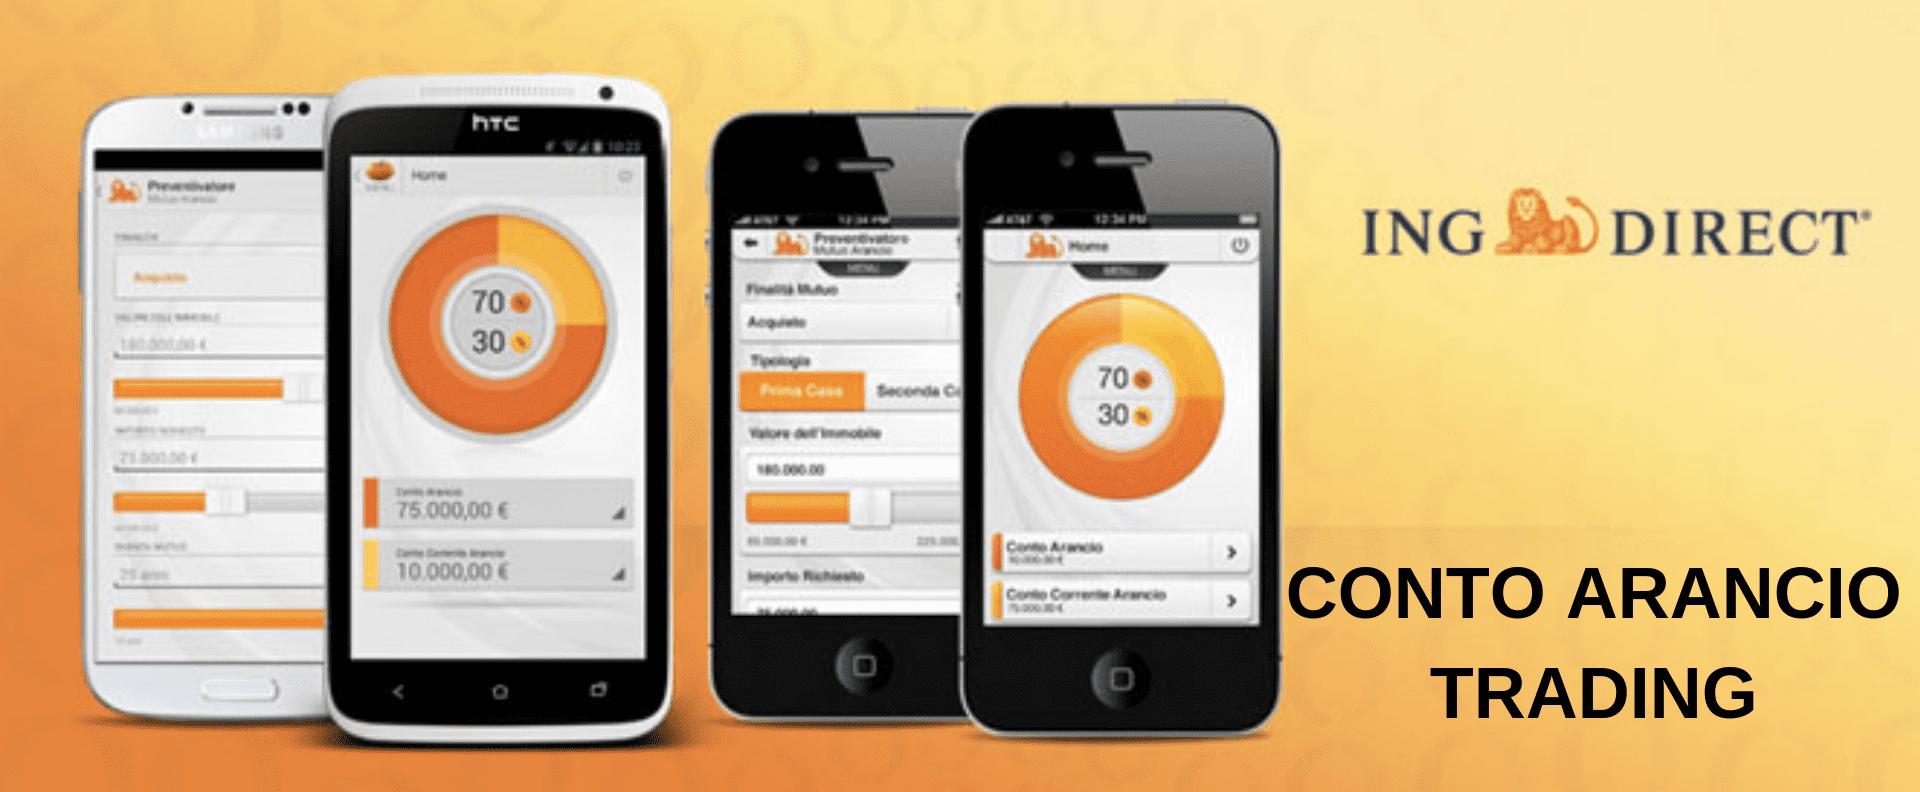 lavorare risparmio casa roma trading online conto corrente arancio